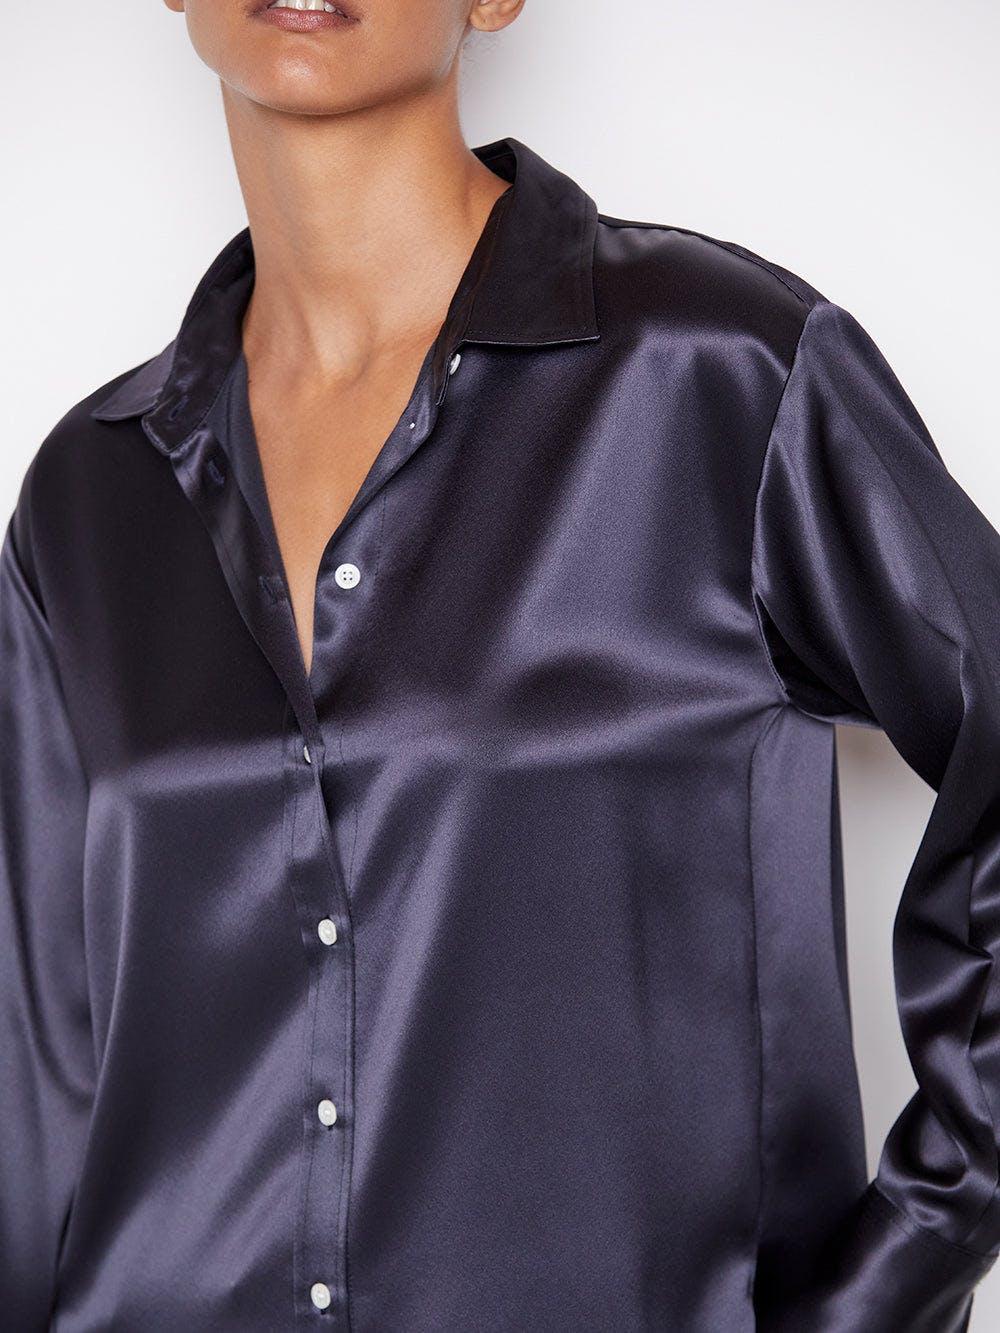 shirt details view